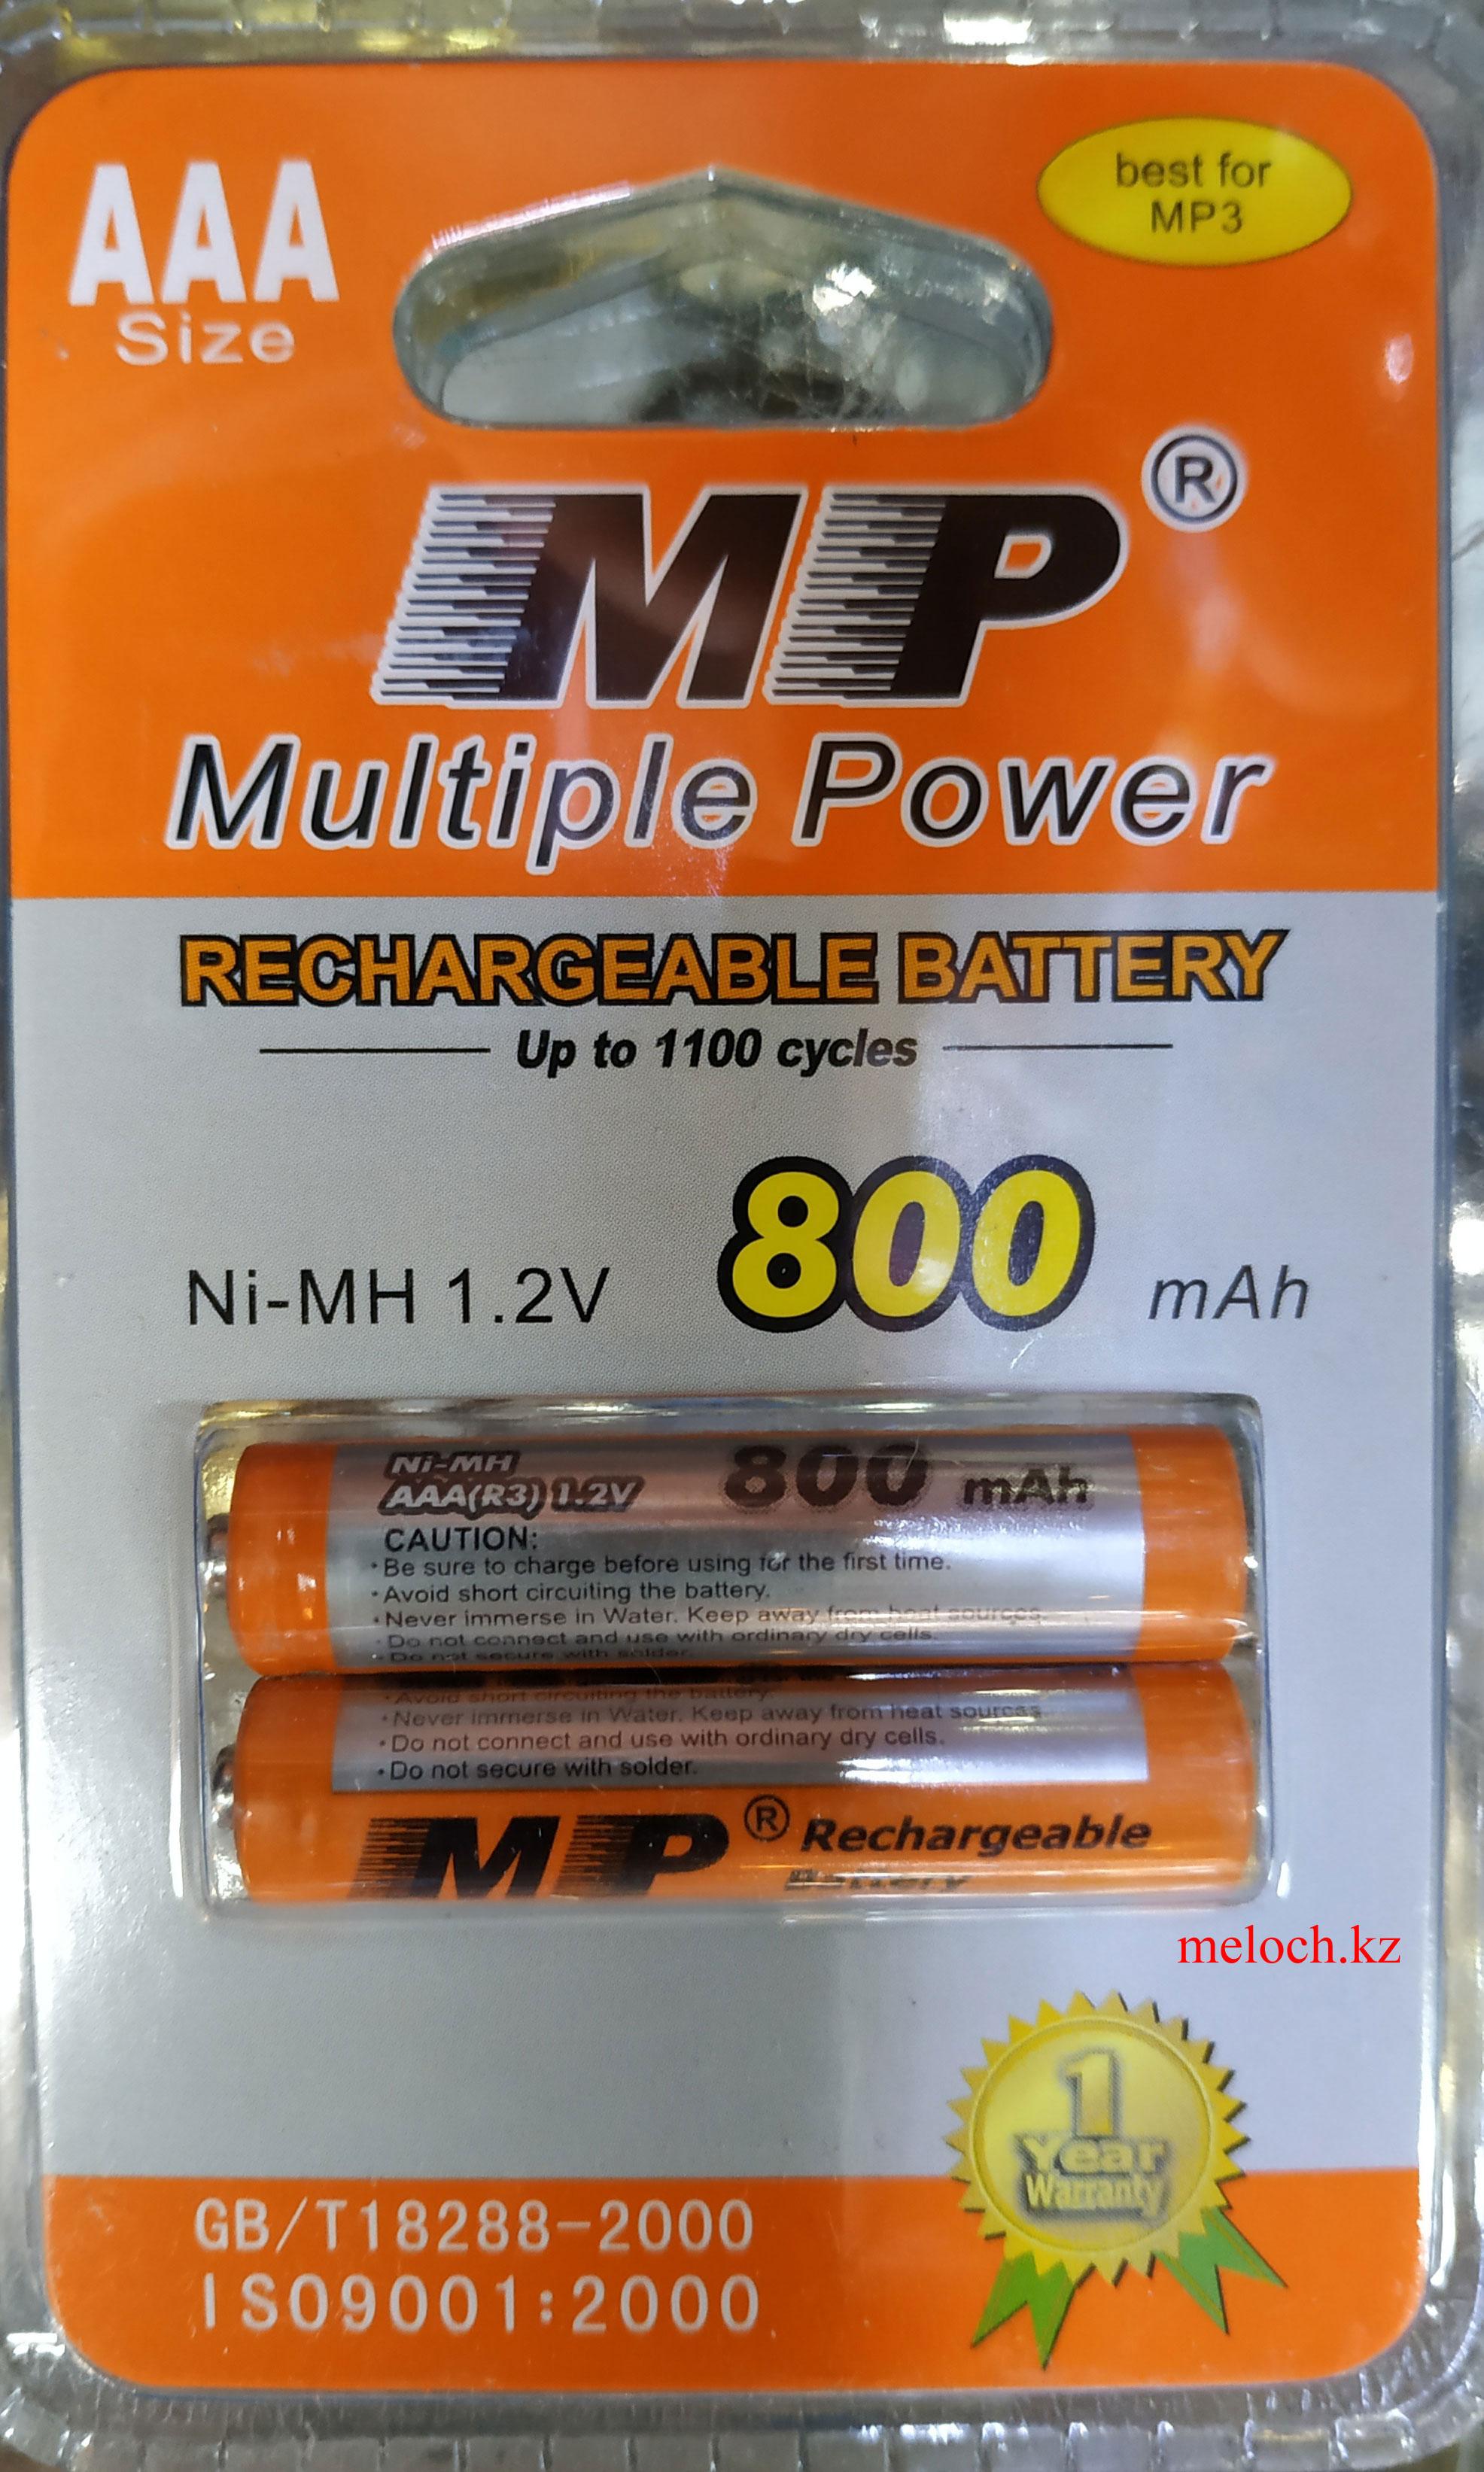 как эксплуатировать аккумуляторные батарейки